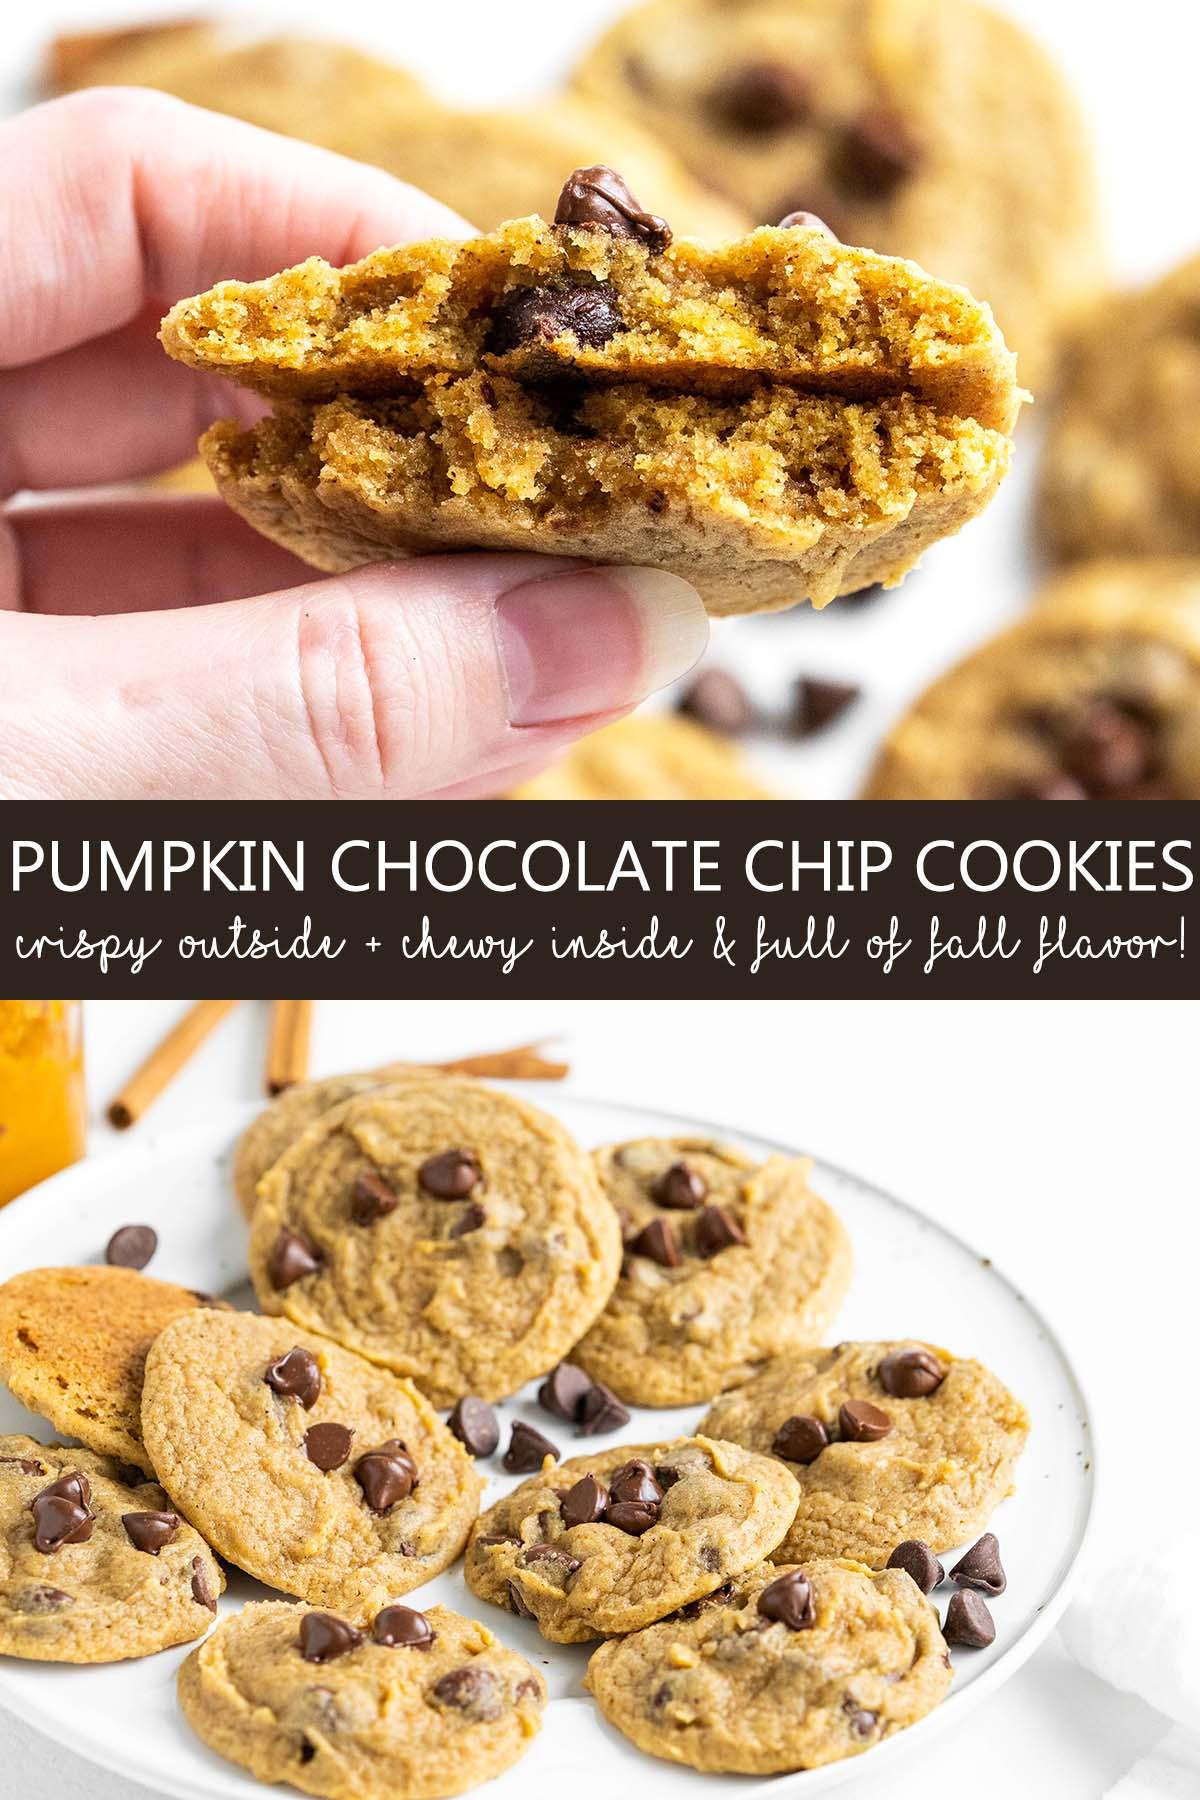 pumpkin chocolate chip cookies recipe pin